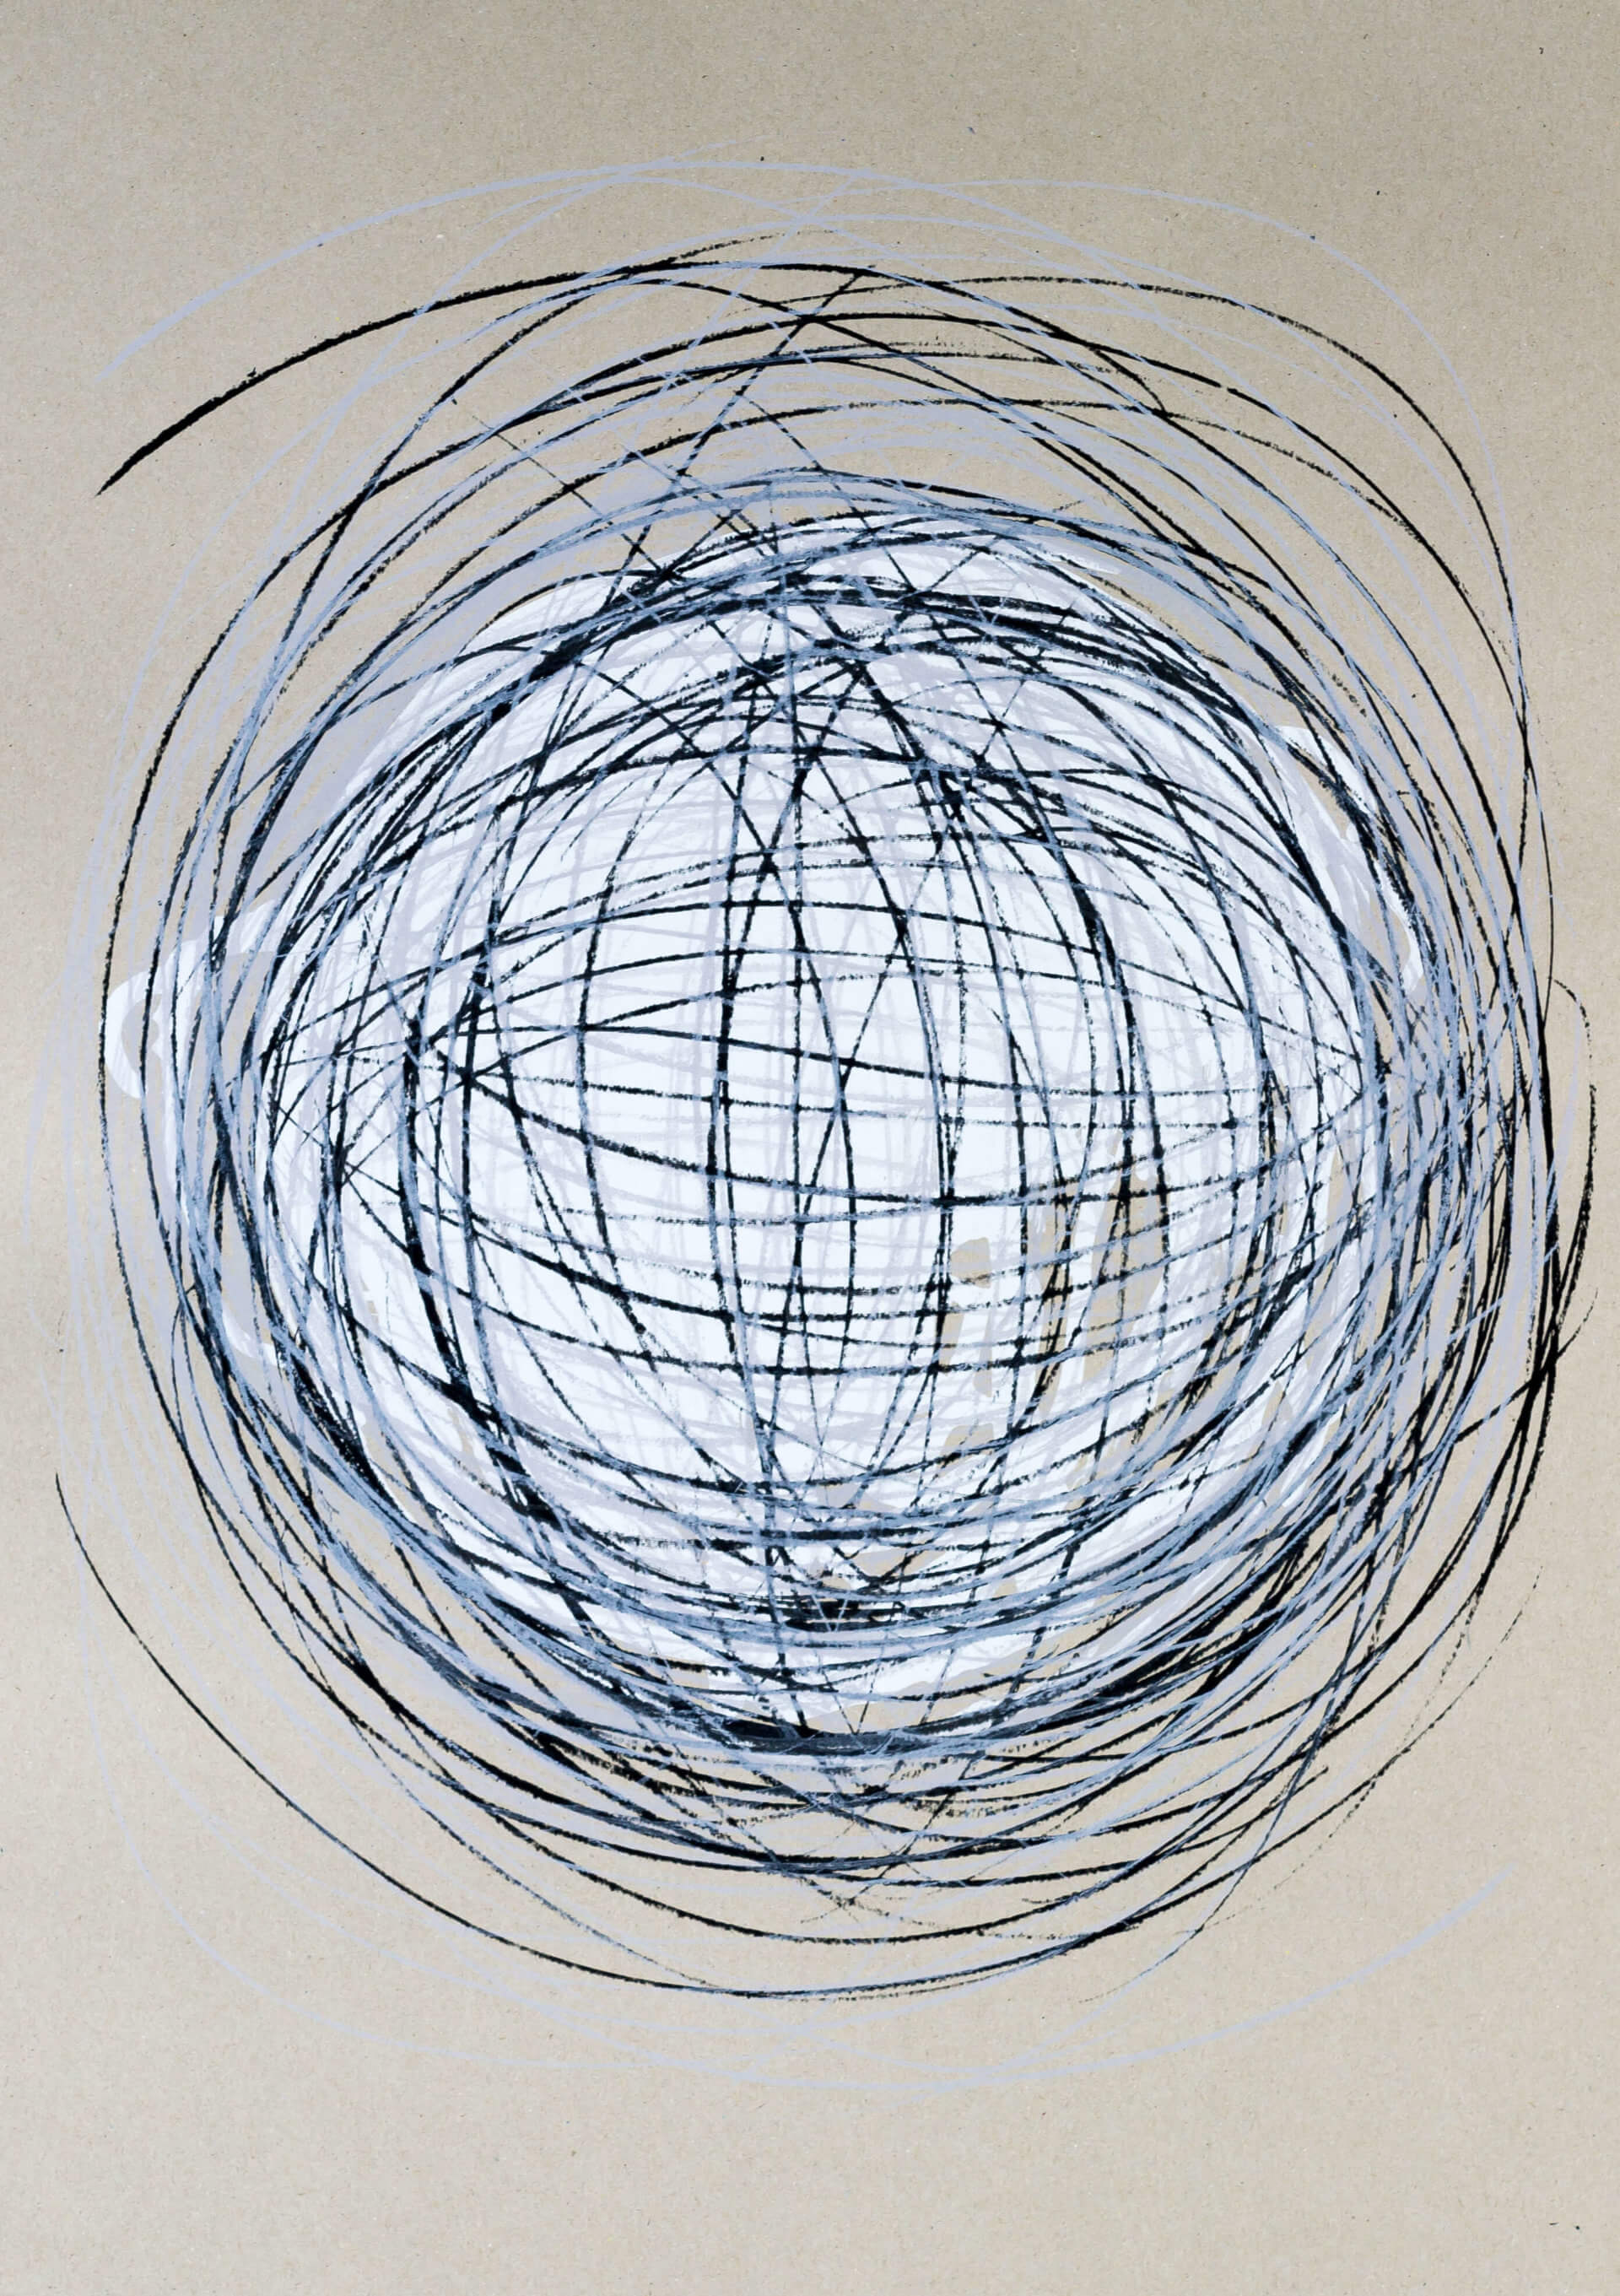 Katharina Albers, Transformation XXVI, 2011, Siebdruck, Unikat, 59,5x42cm